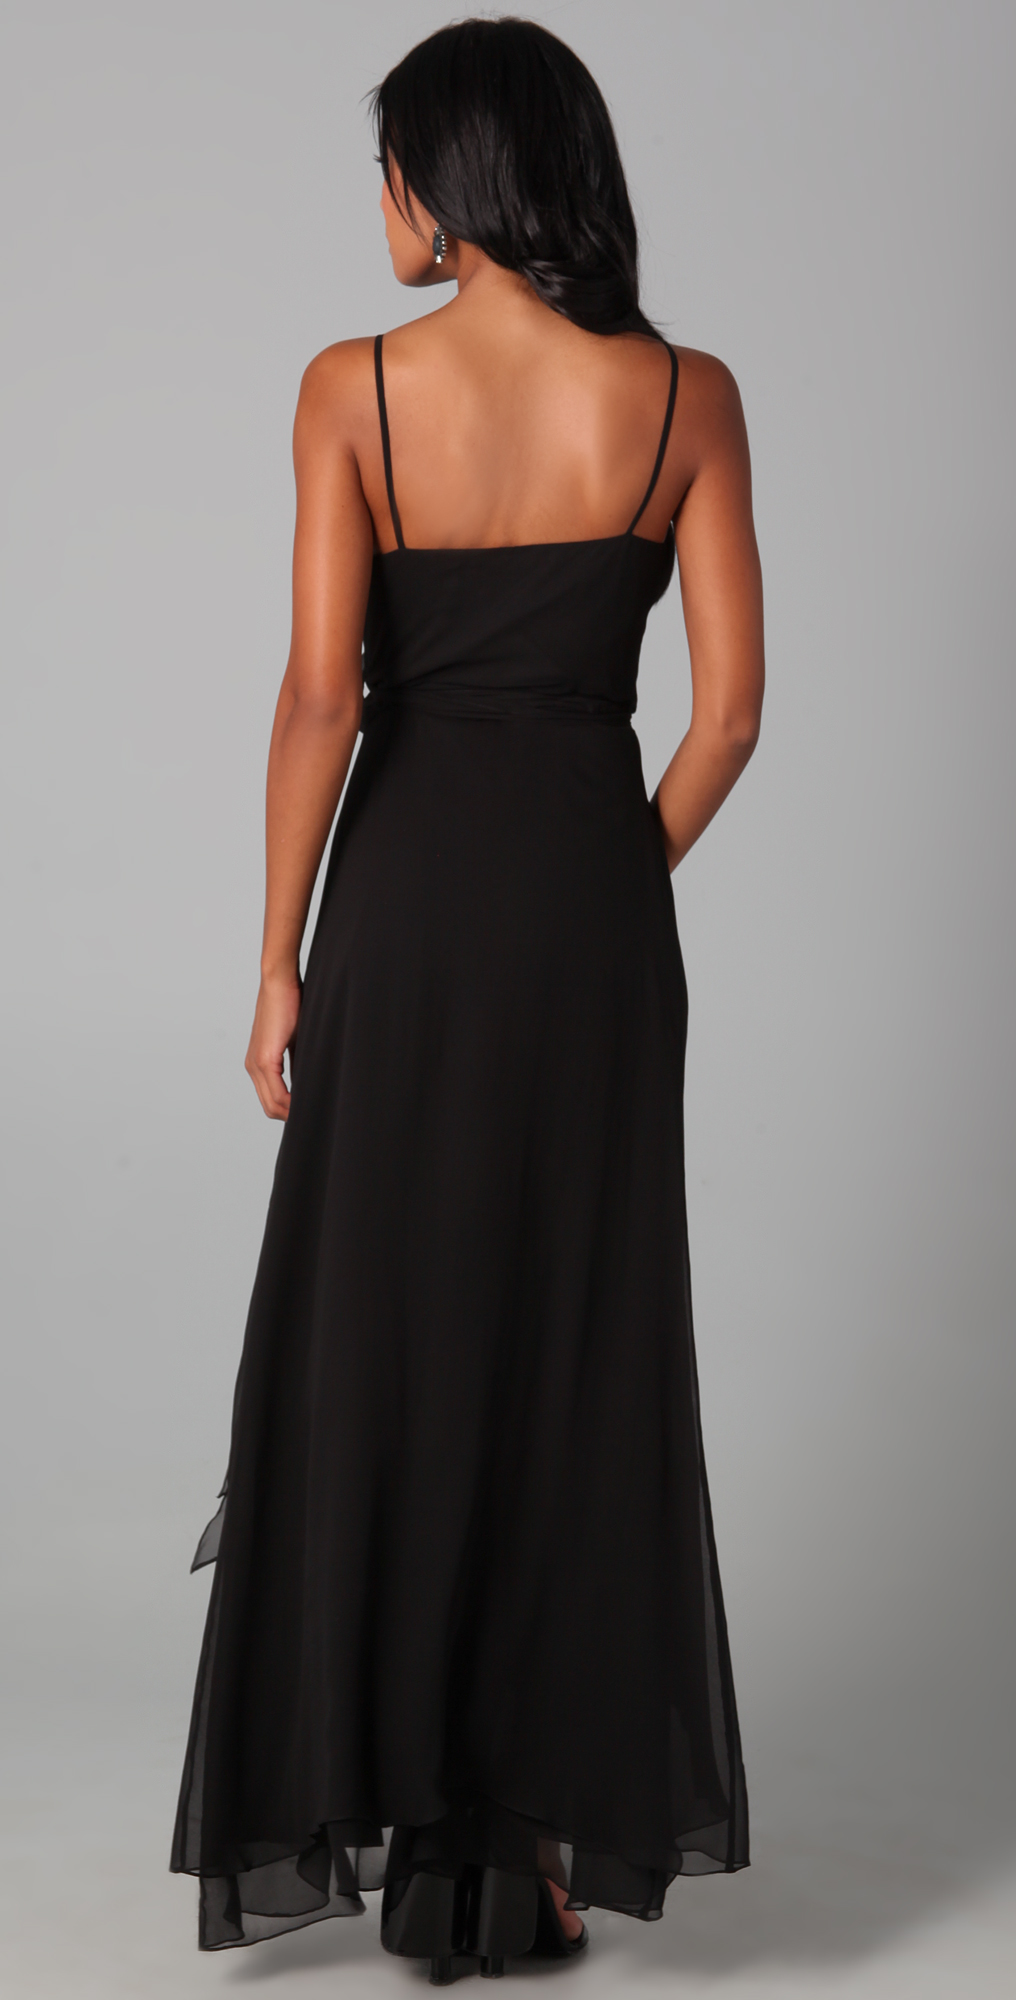 Jcpenney Junior Short Dresses | Saddha